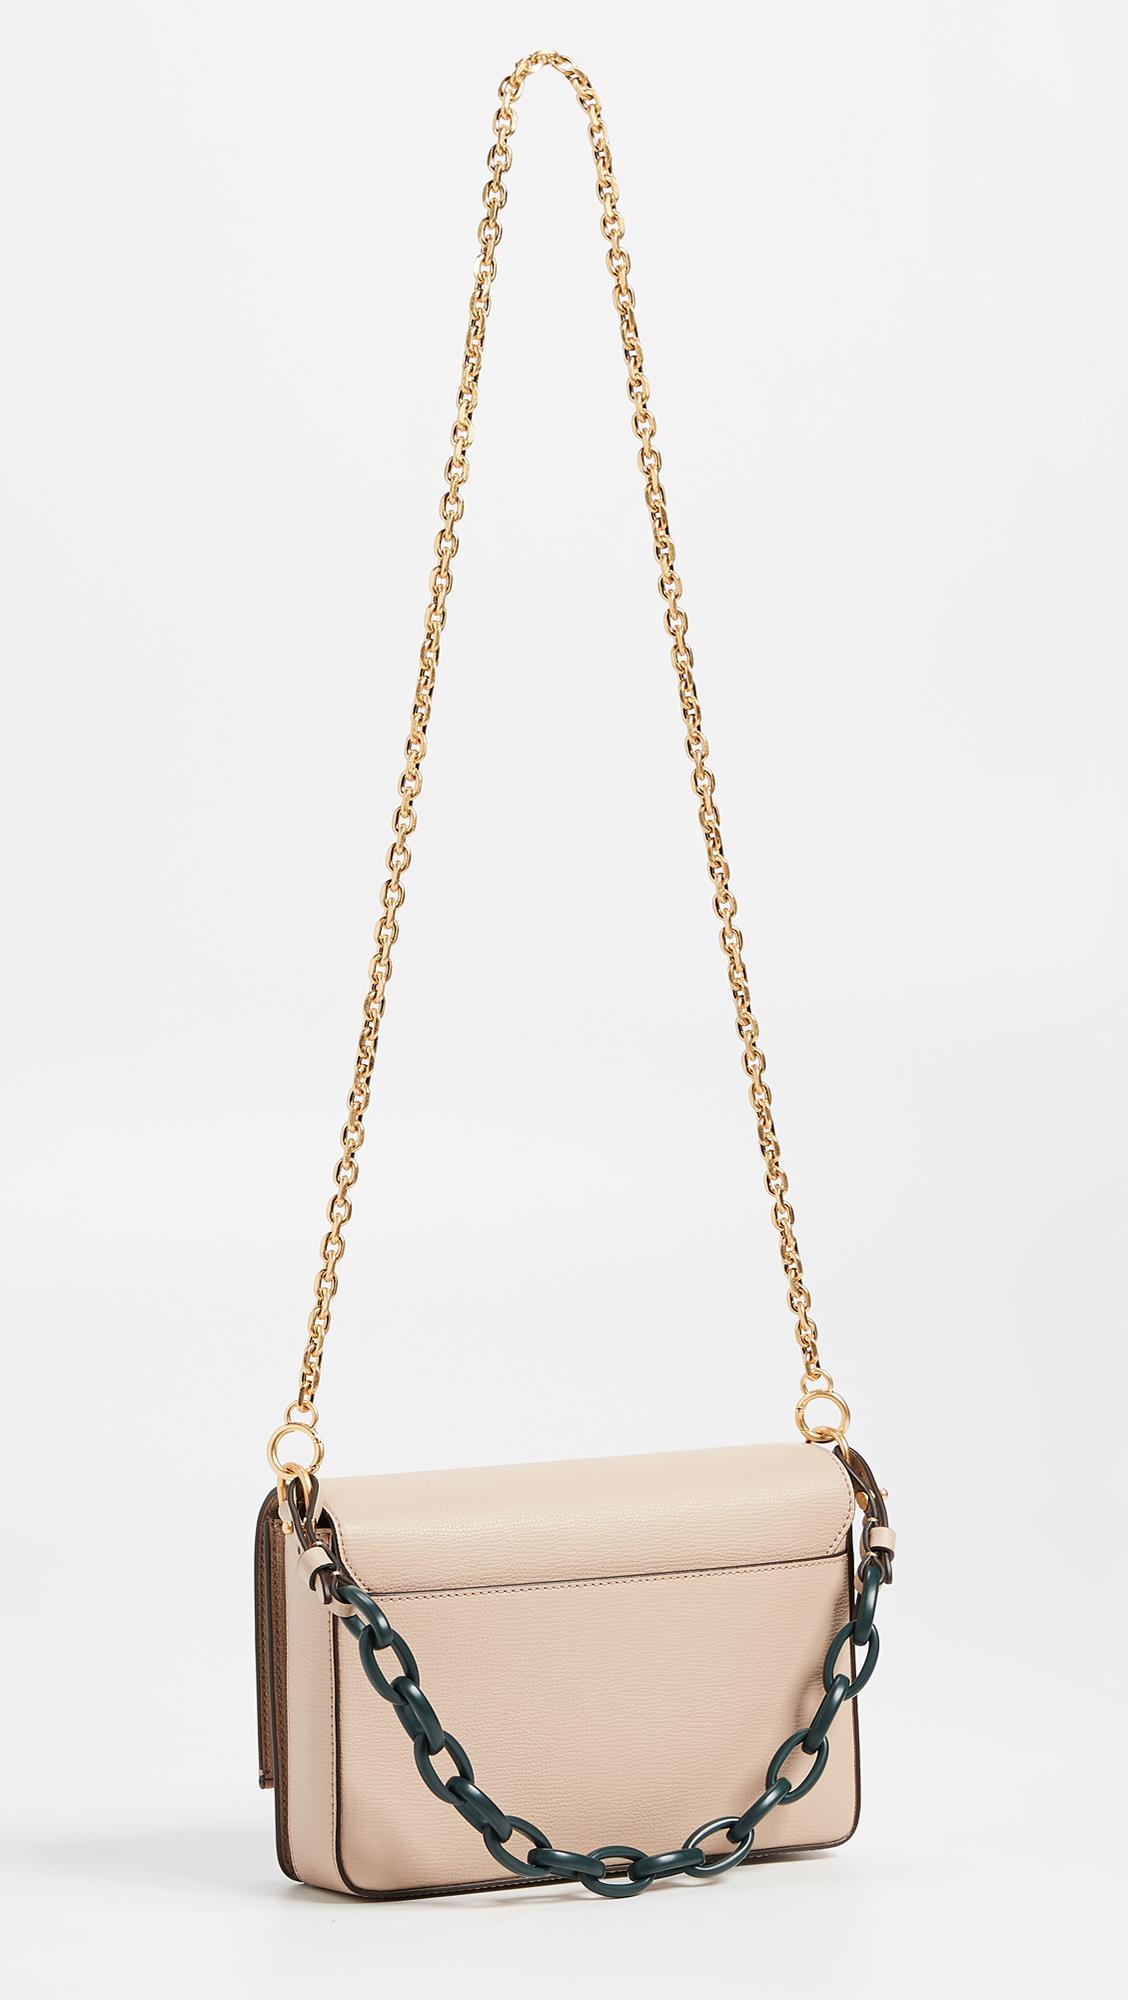 6c7cb458f2e50e Lyst - Tory Burch Kira Double Strap Shoulder Bag in Natural